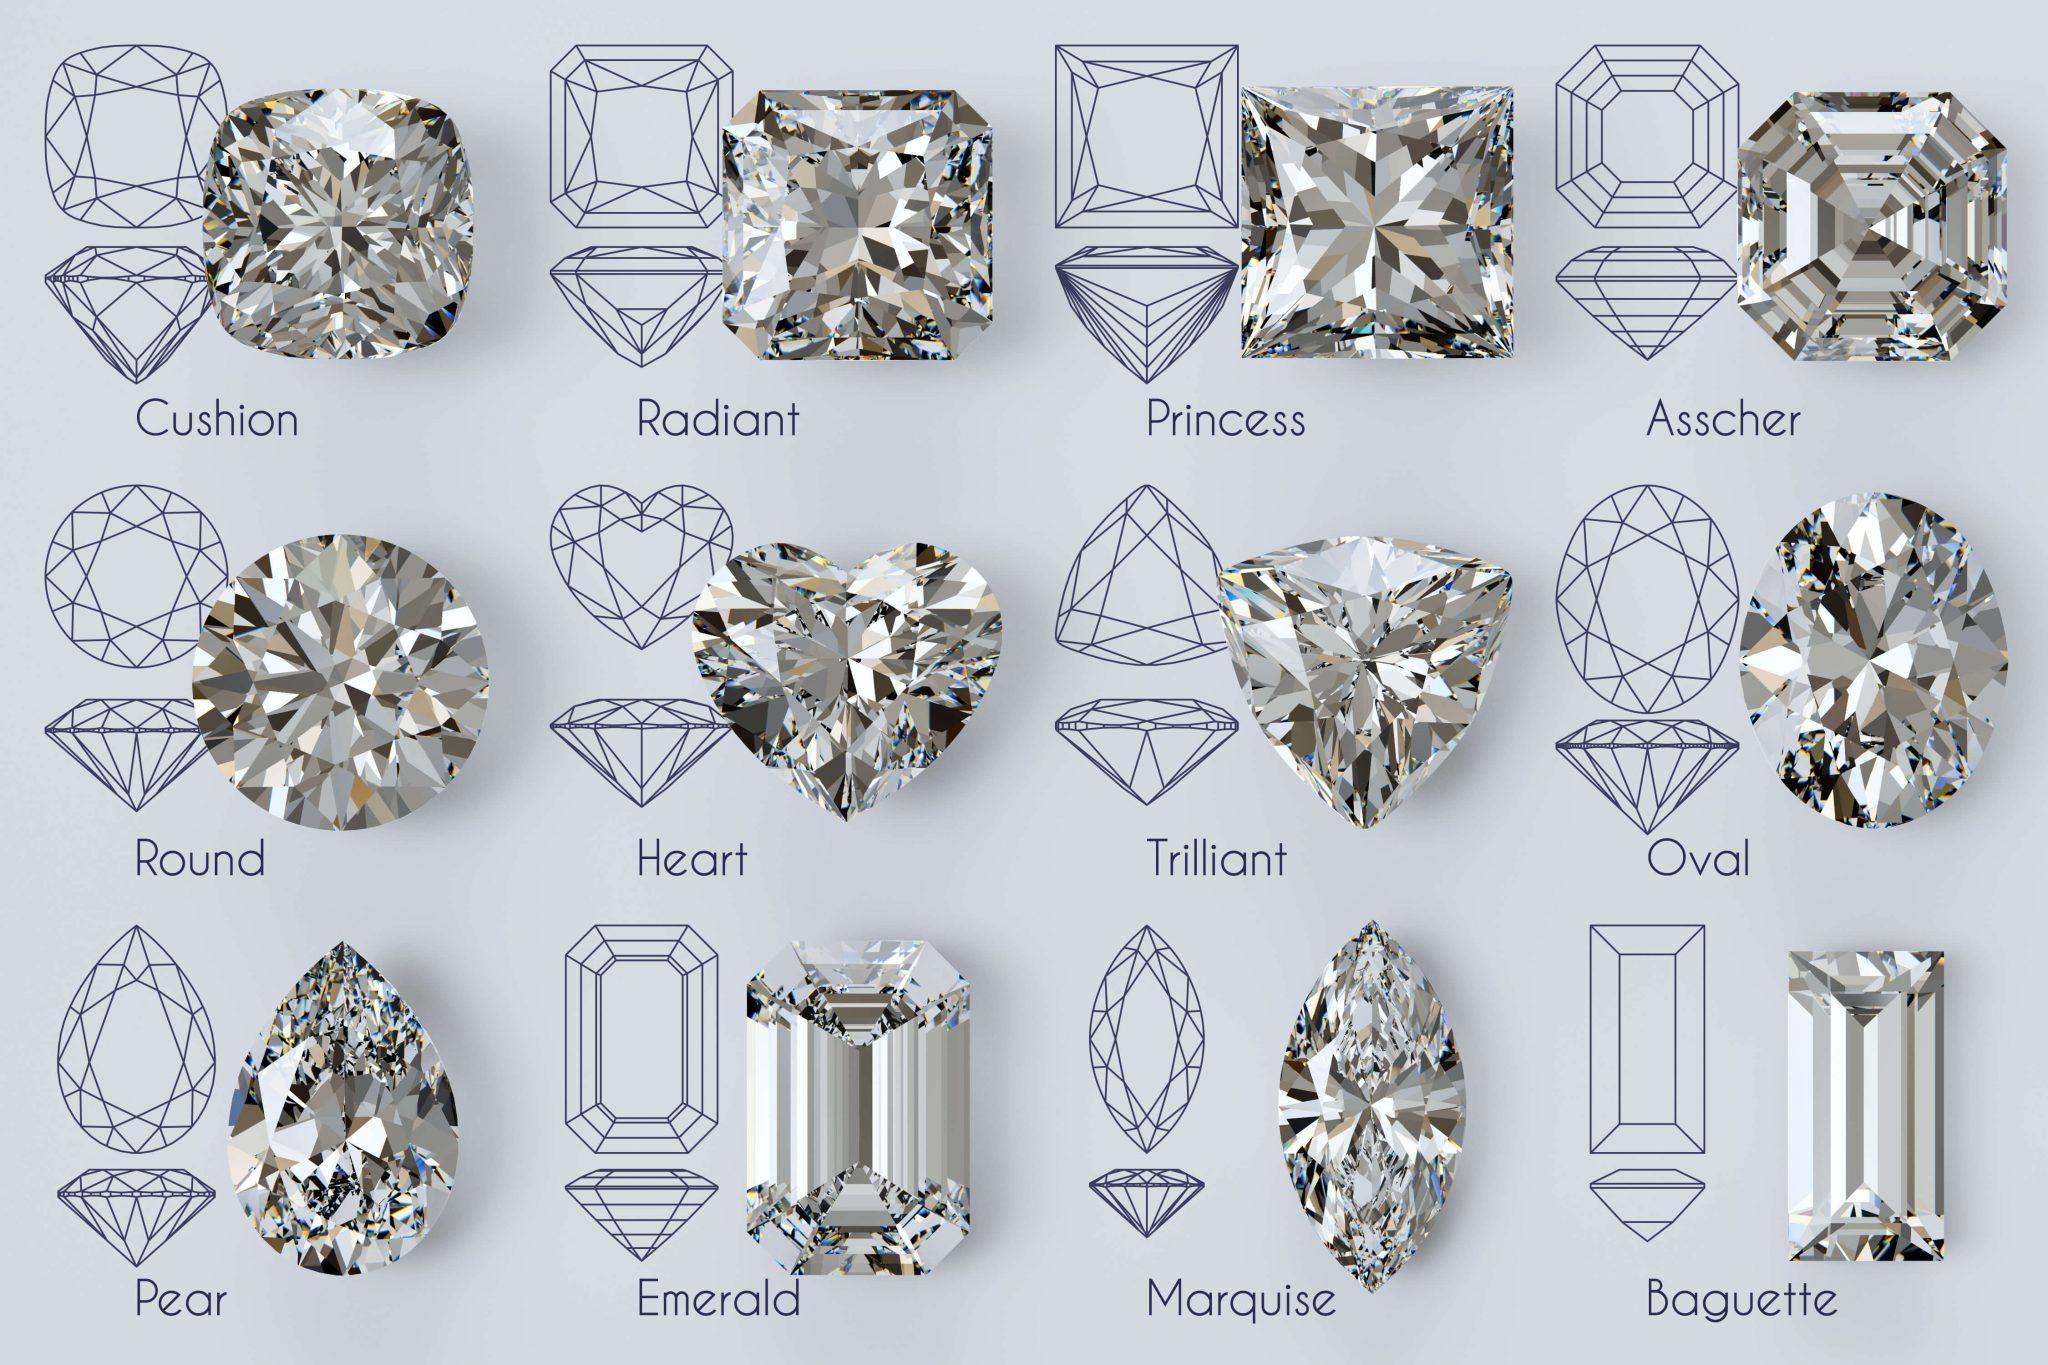 Twelve popular diamond shapes